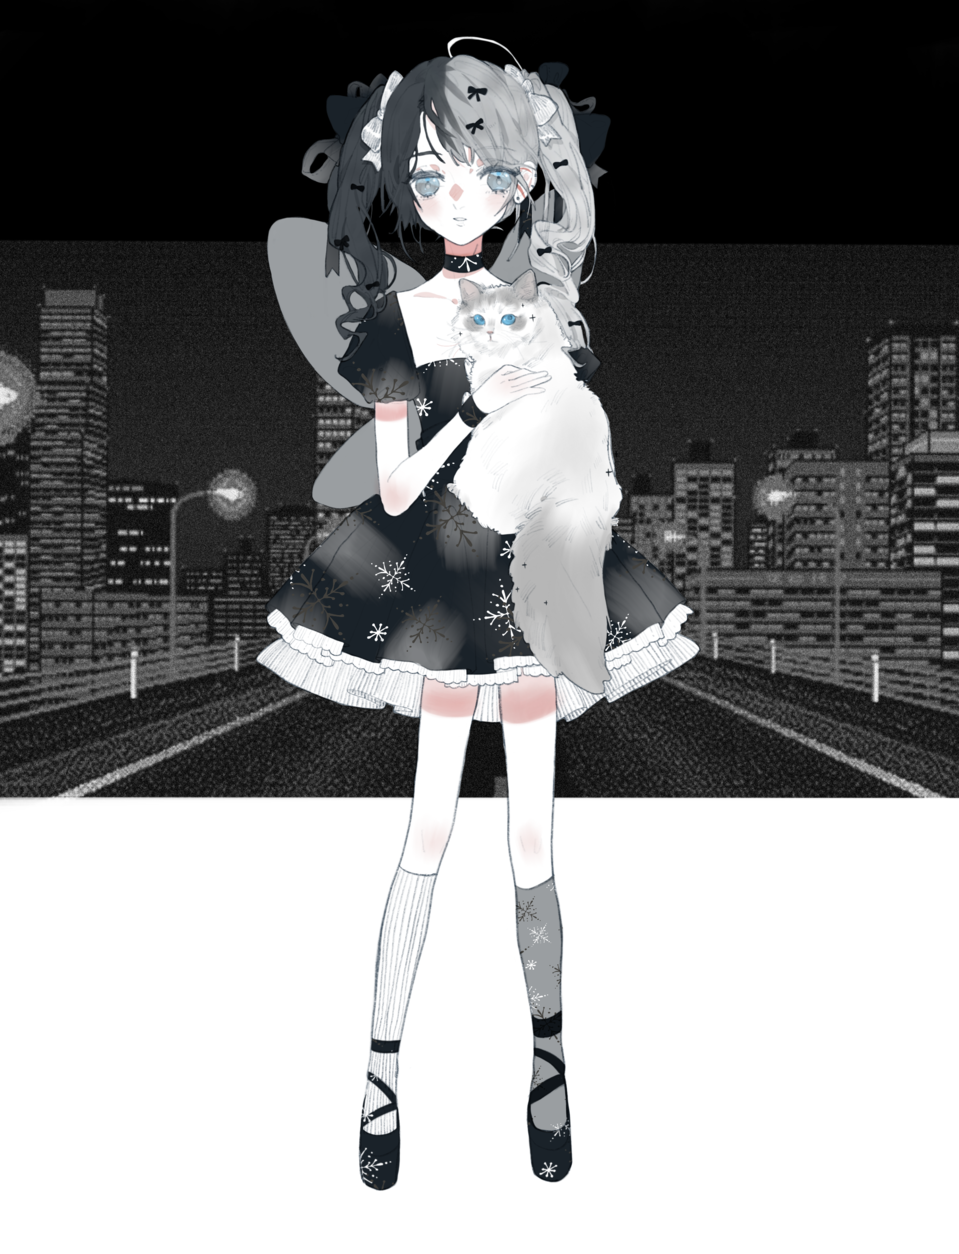 ✨tonight🌃 Illust of 九木口冬 Aug.2019Contest